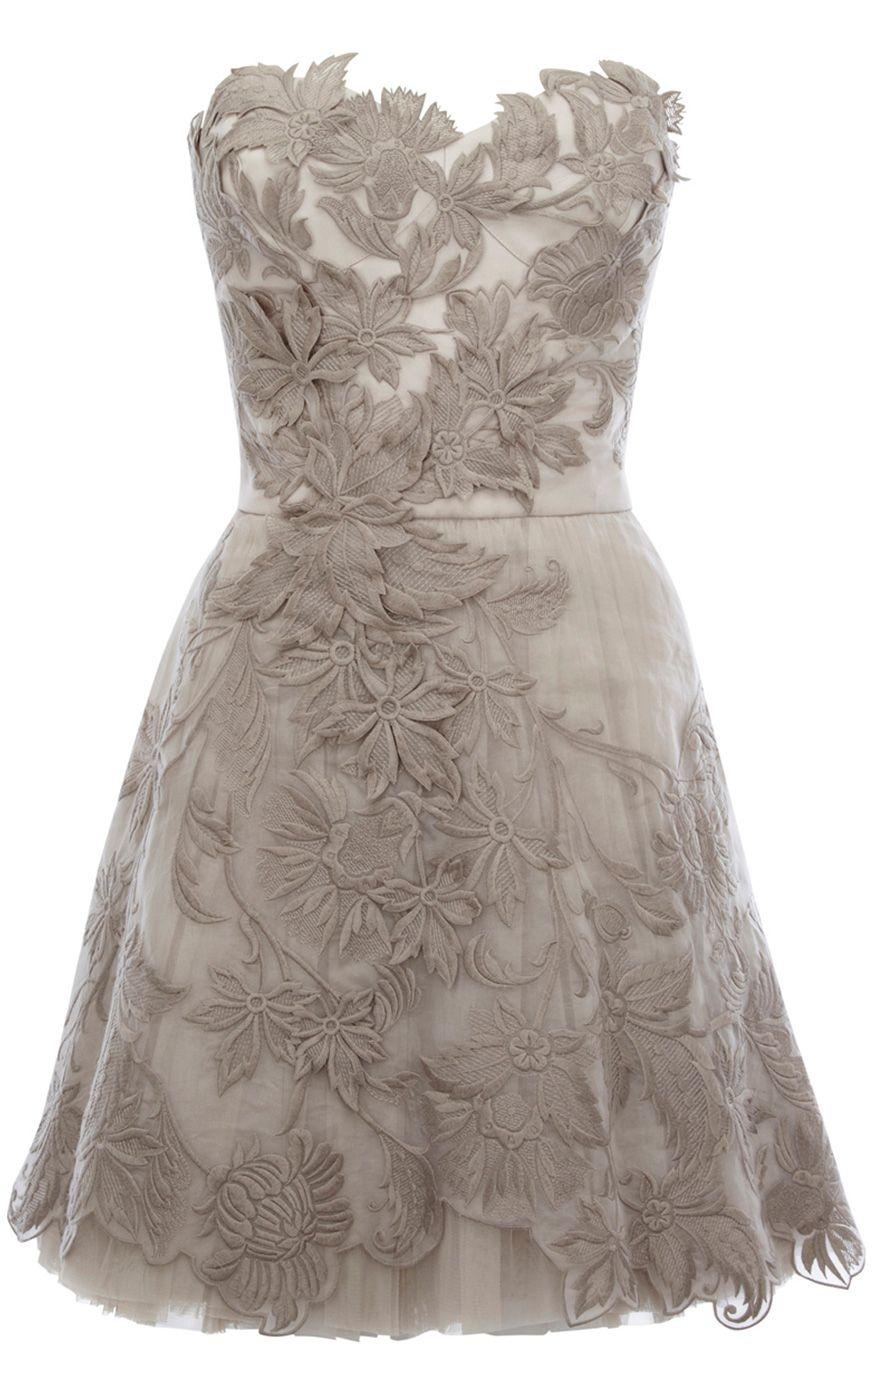 Karen Millen Romantic Embroidery Strapless Tutu Dress Silver